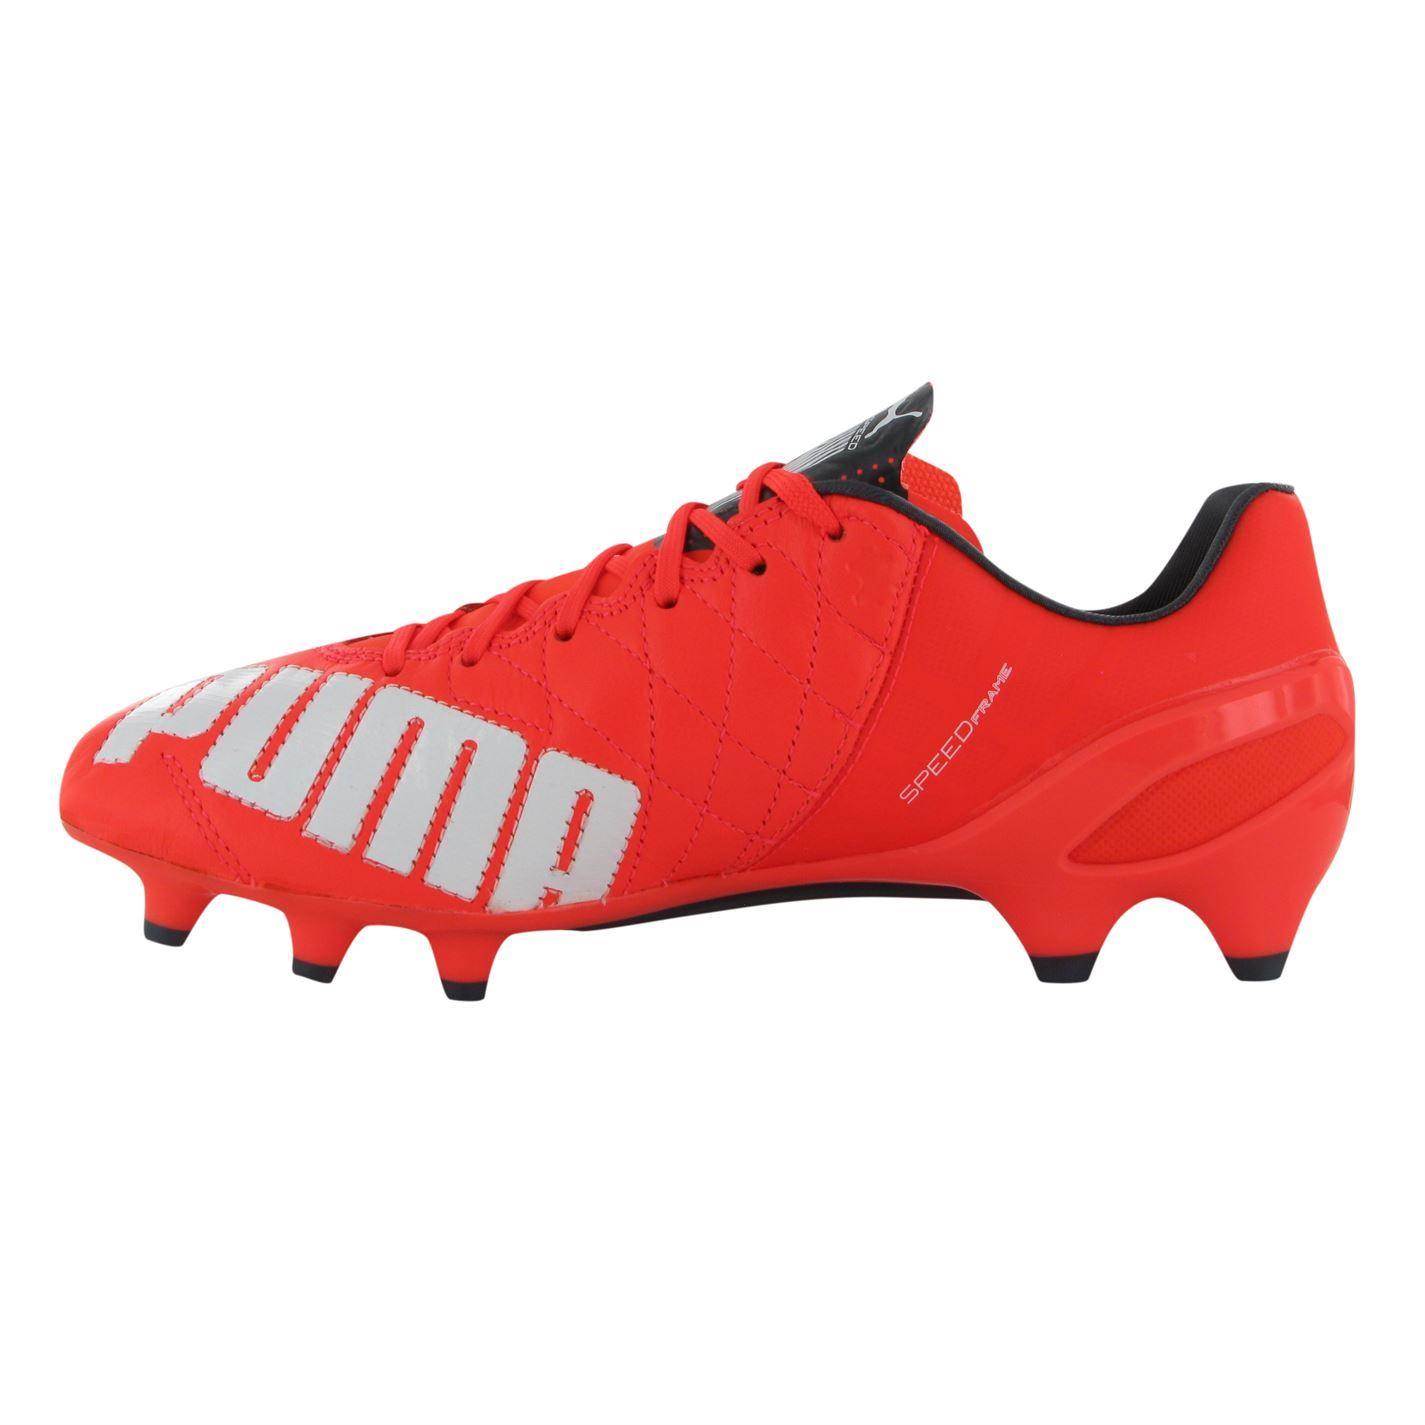 ... Puma evoSpeed 1 Leather FG Firm Ground Football Boots Mens Lava Soccer  Cleats 9d3b527b3